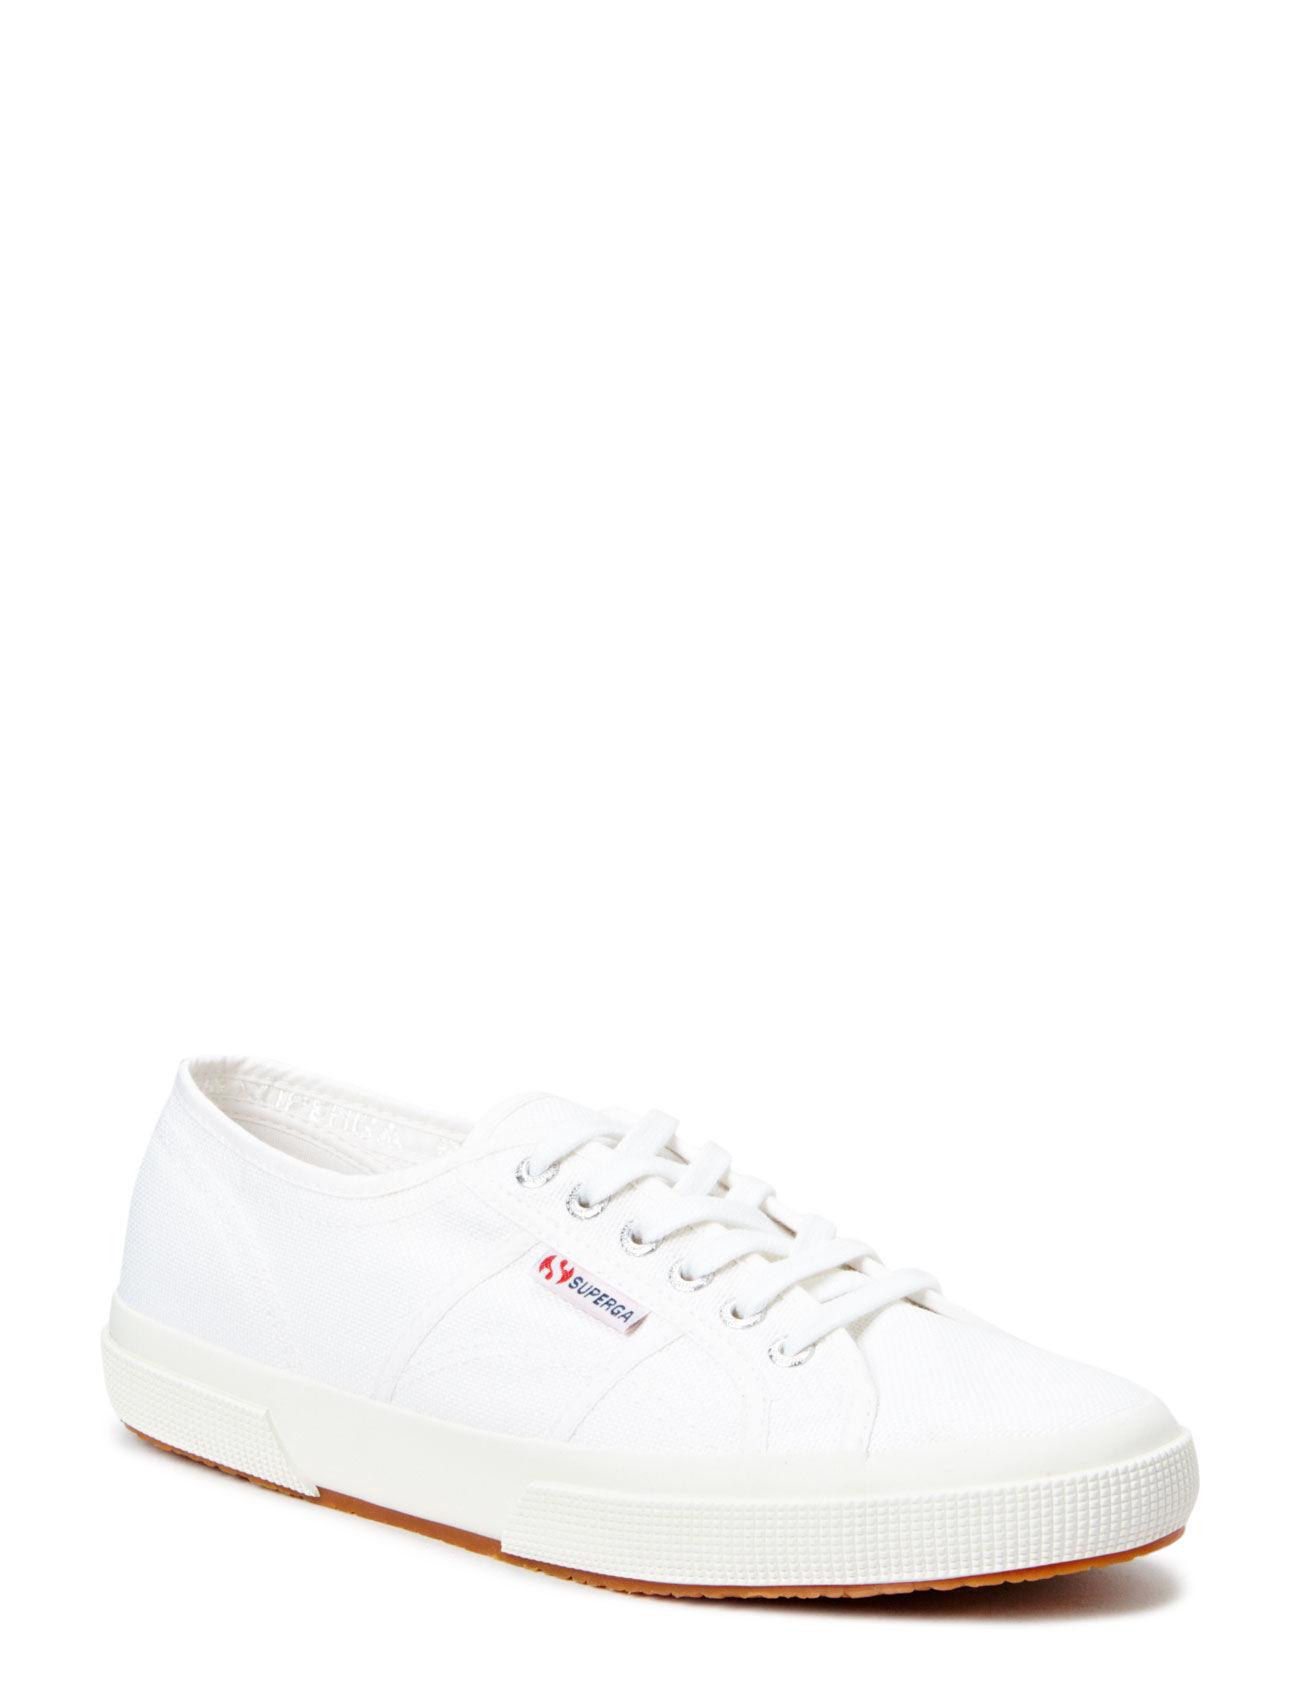 Superga 2750 Cotu Classic Superga Sneakers til Herrer i